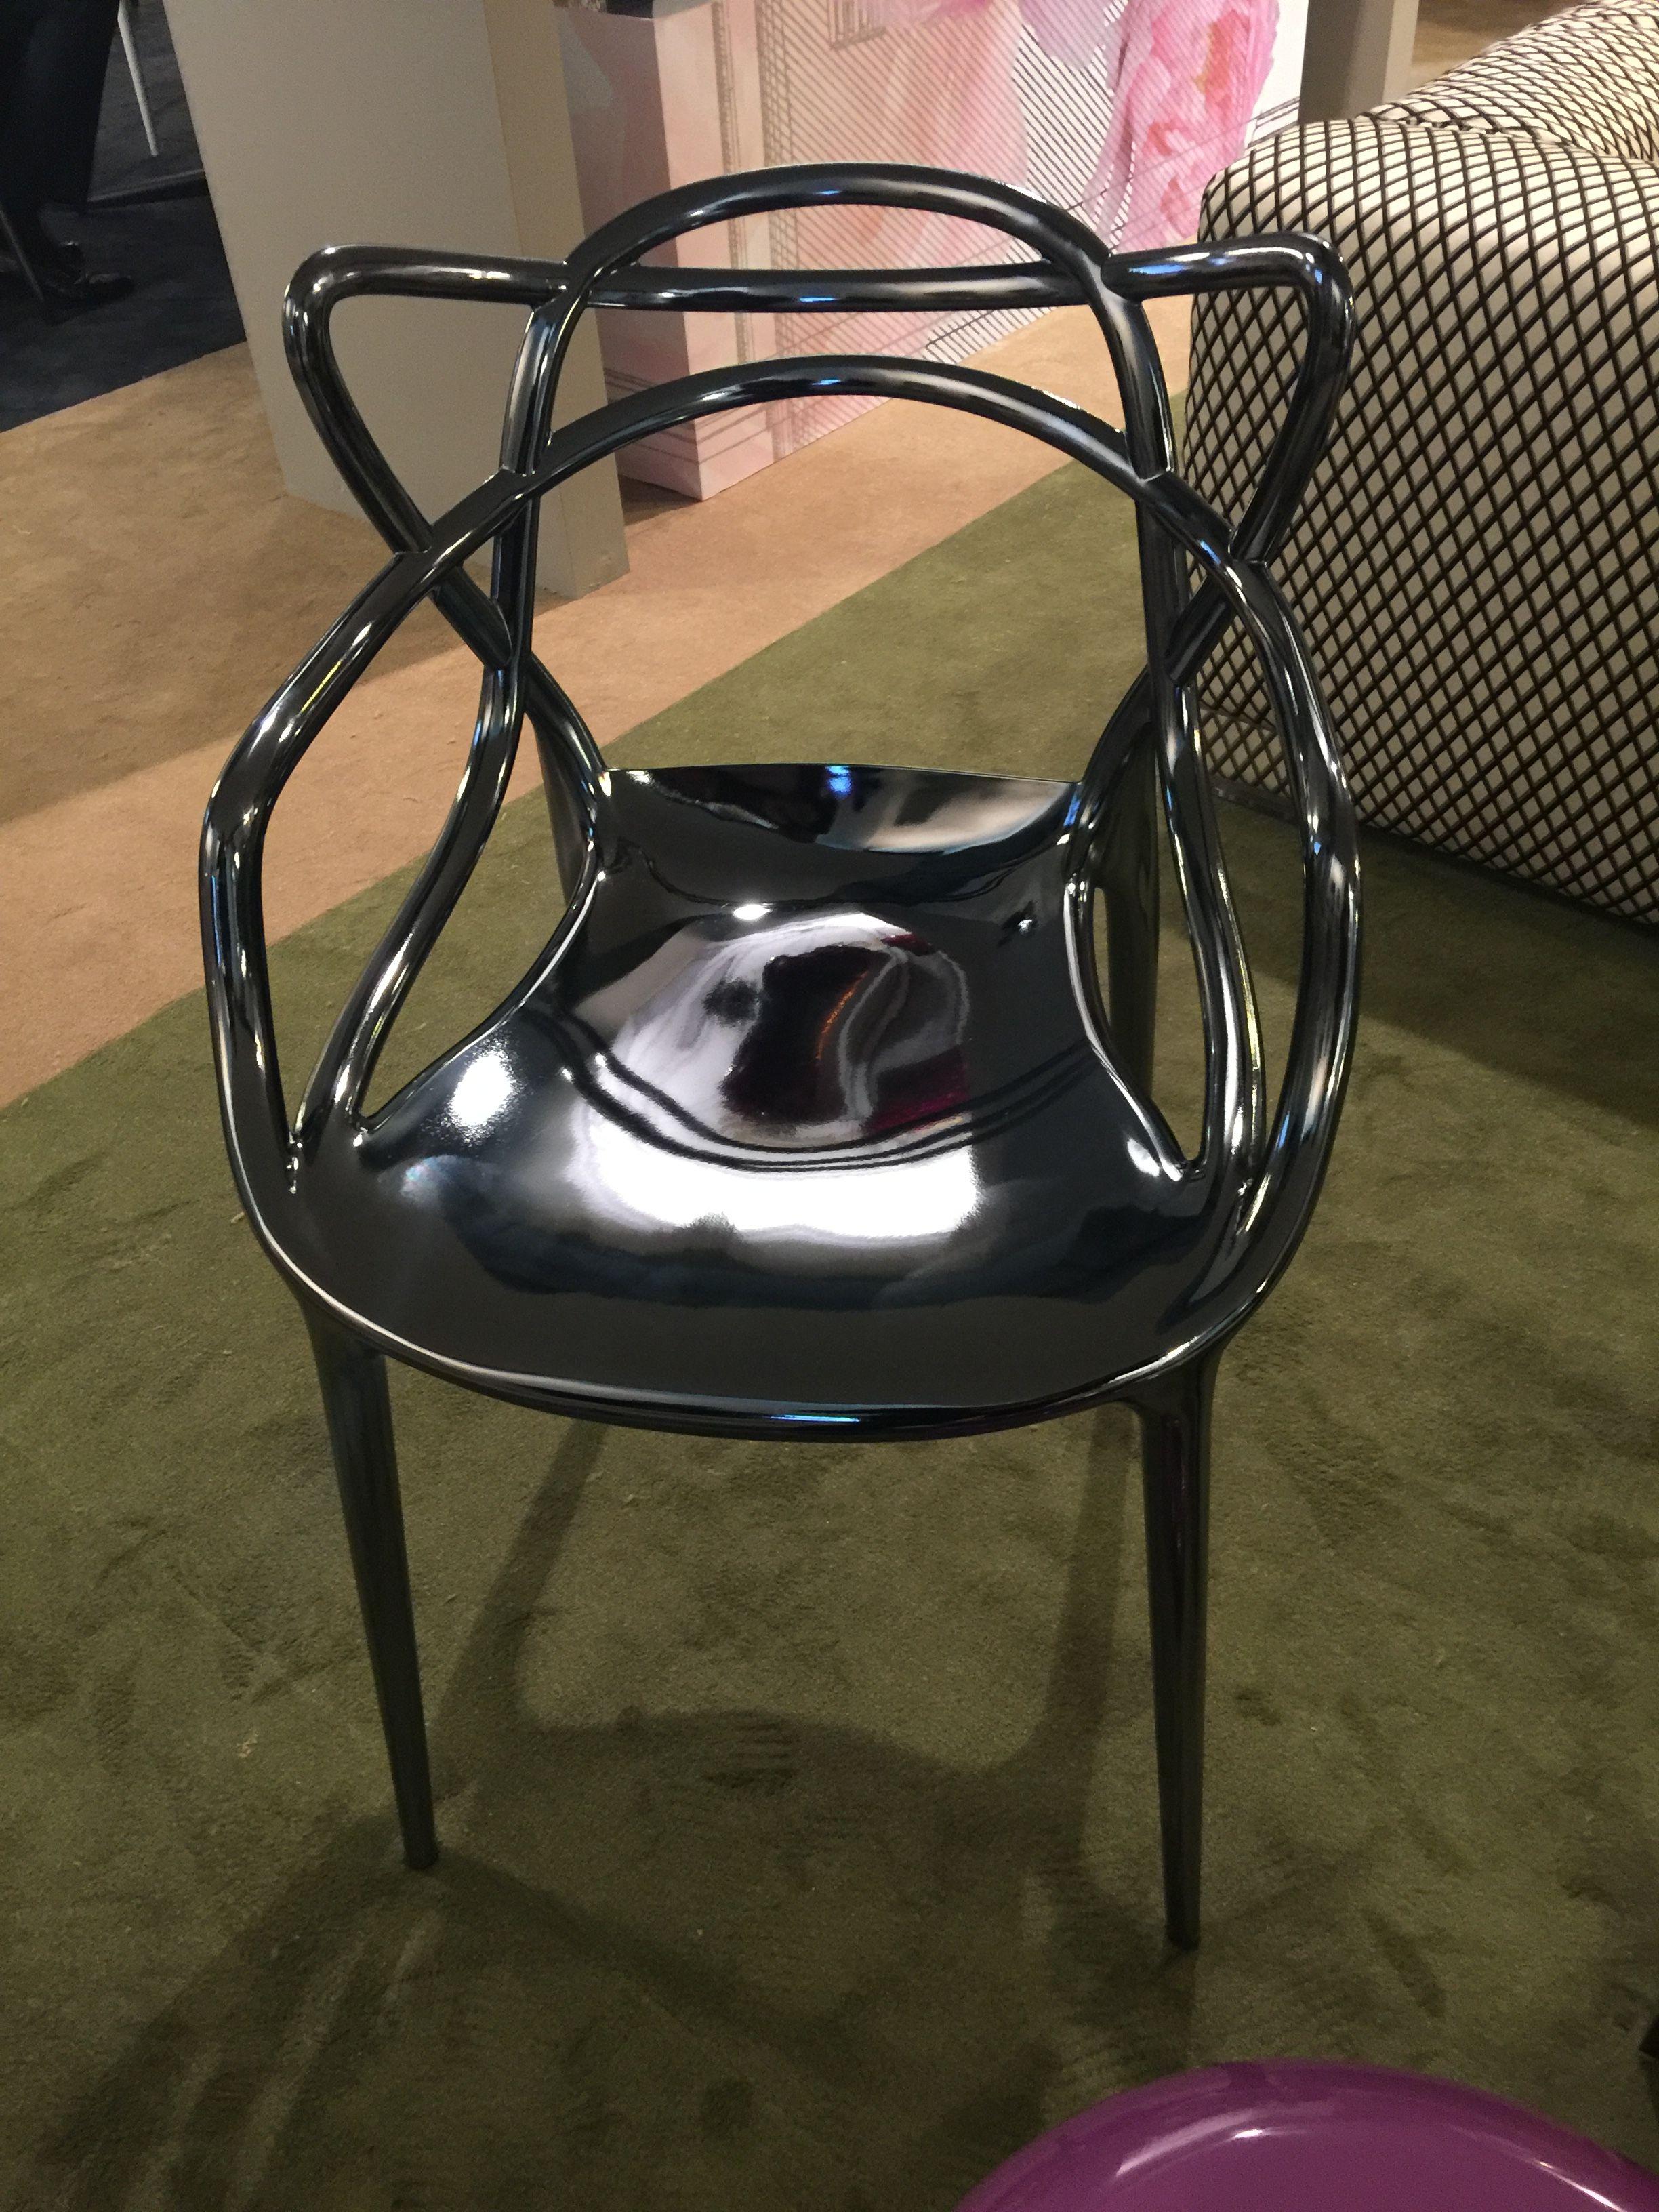 Kartell mobili bagno amazing accessori bagno kartell specchio franois ghost di kartell in with - Accessori bagno kartell ...